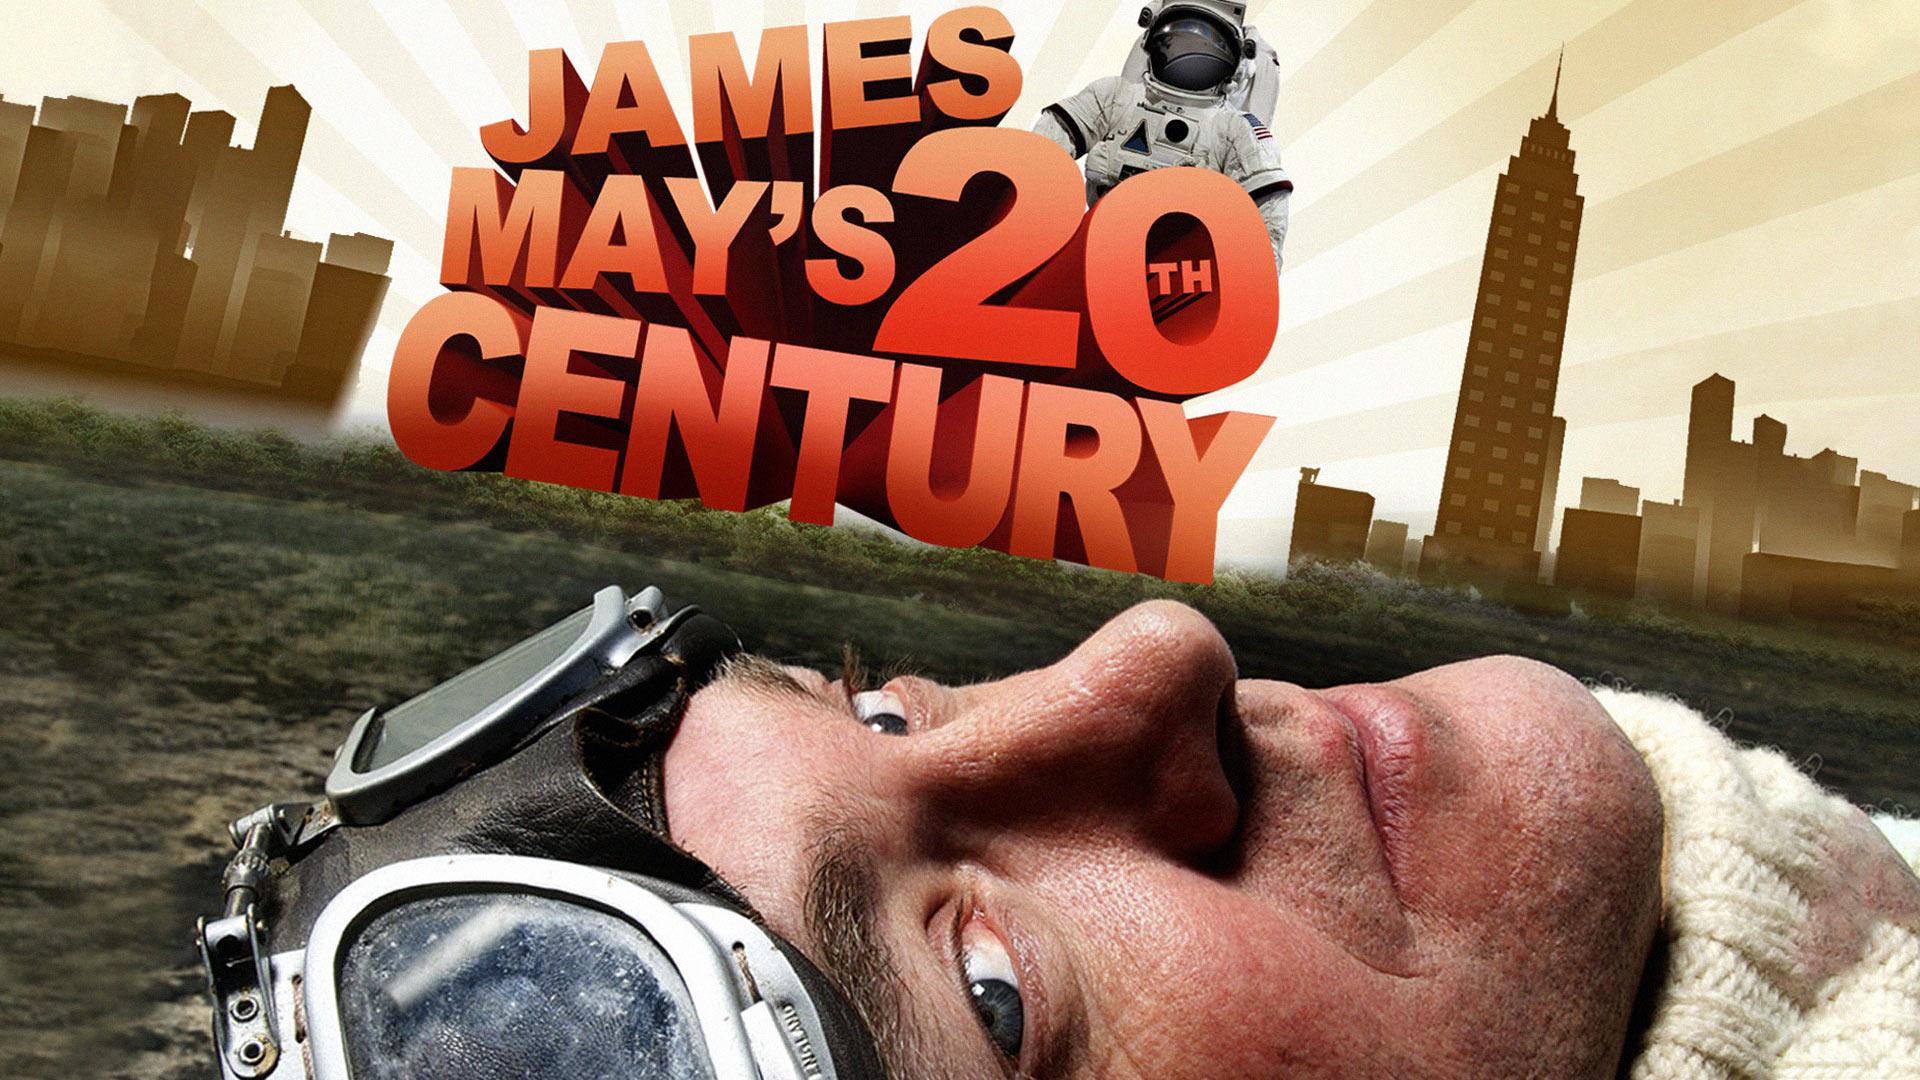 James May's 20th Century Season 1